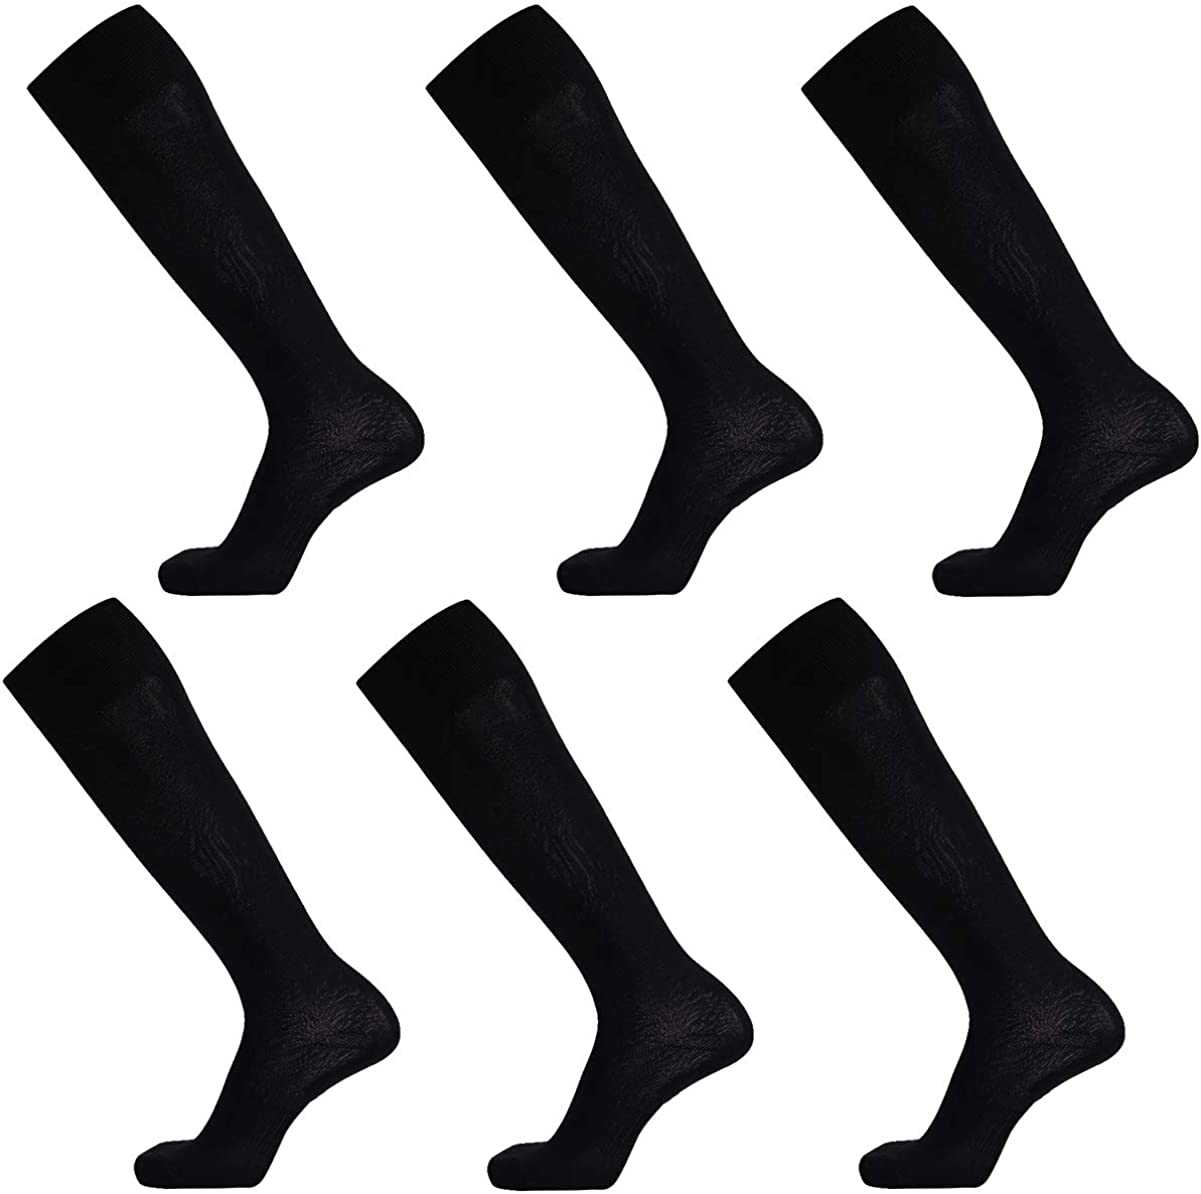 Dsource Unisex Soccer Socks Knee High Solid Baseball Football Sports Team Socks 2,6,10 Pairs: Clothing